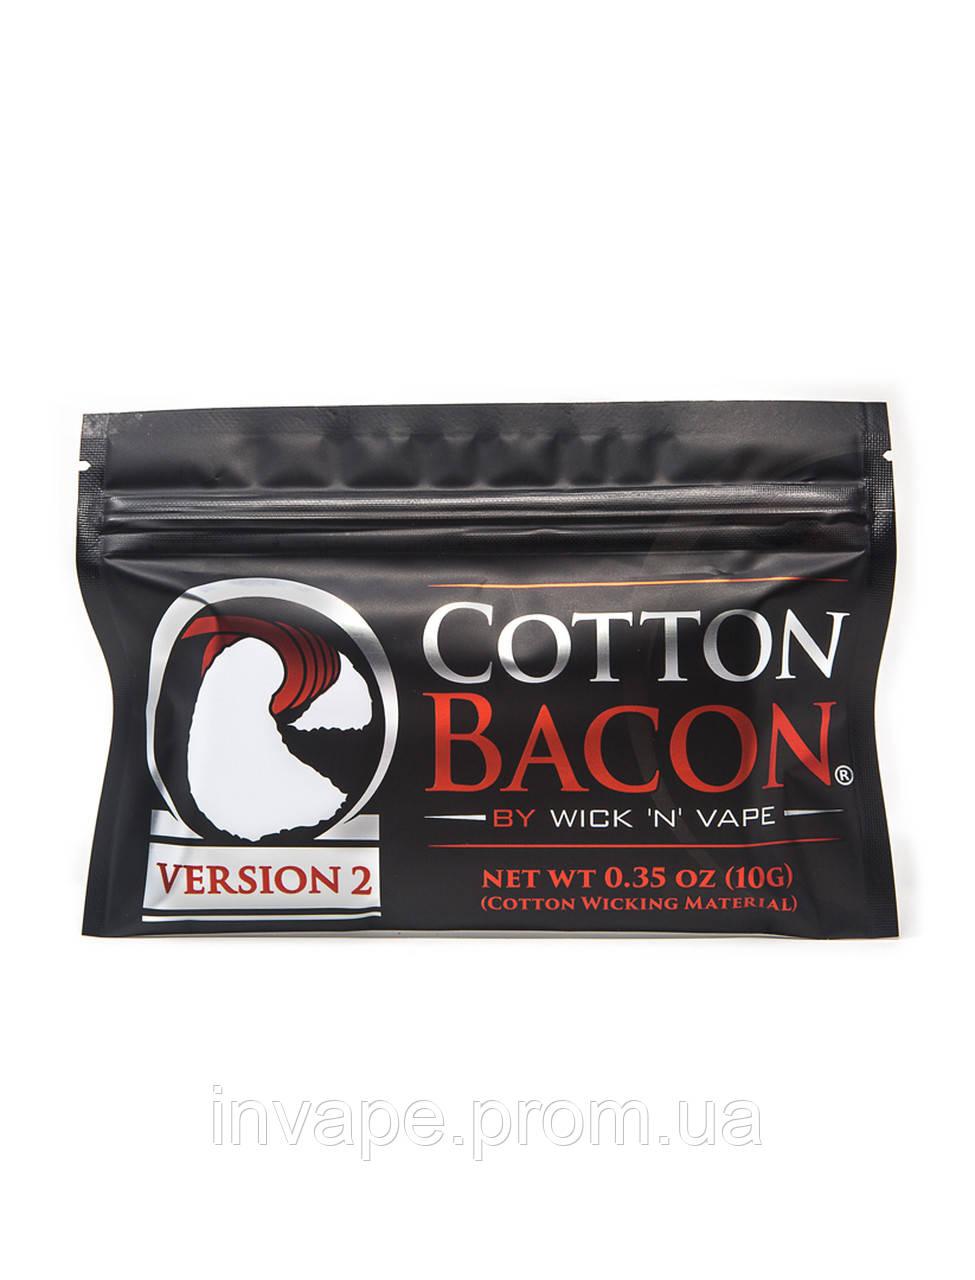 Хлопок Wick 'N' Vape Cotton Bacon Version 2